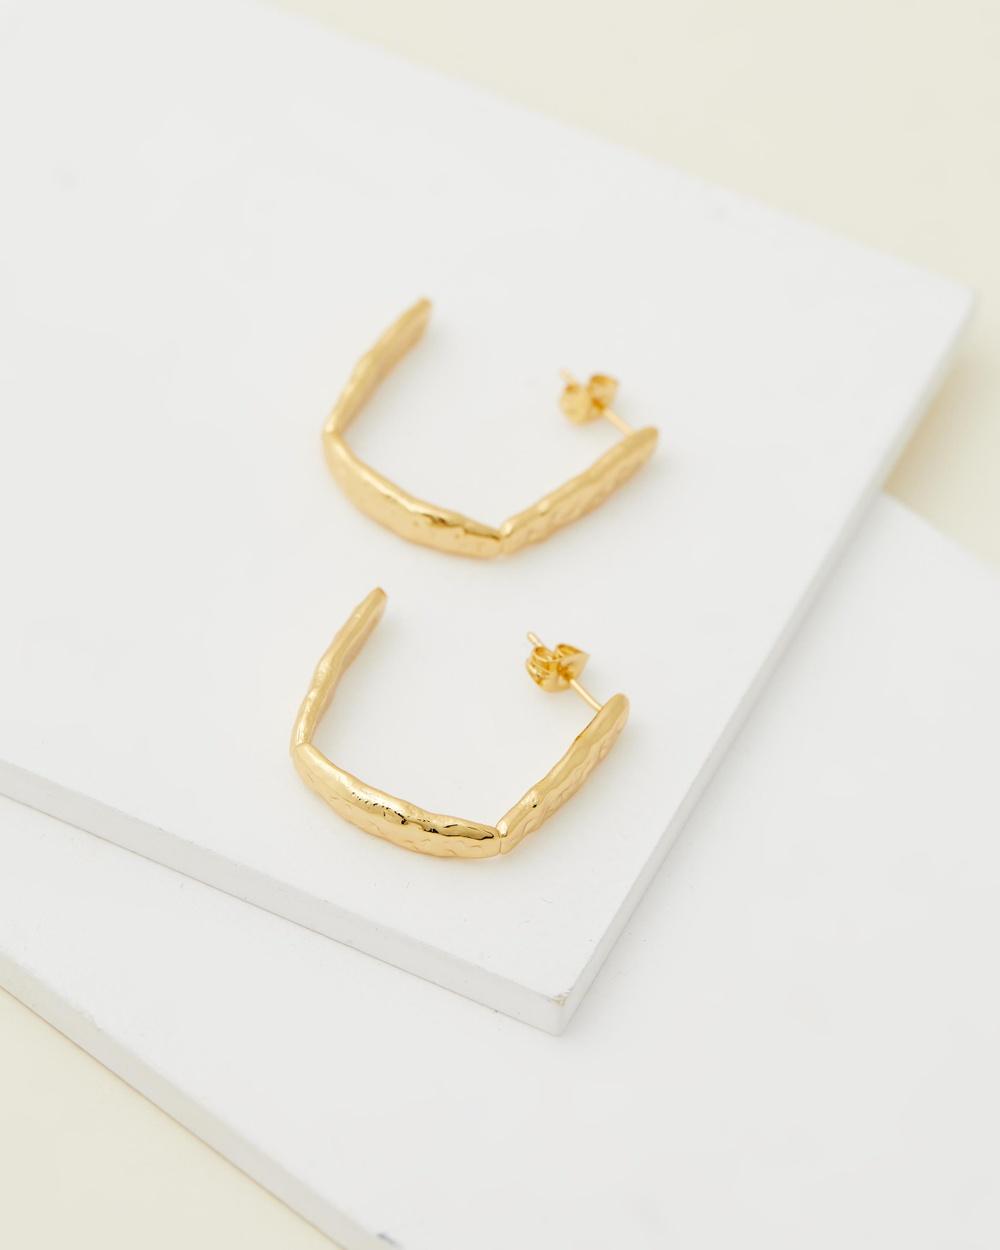 Brie Leon Frida Stud Hoop Earrings Jewellery 925 Base, 18K Gold Plated